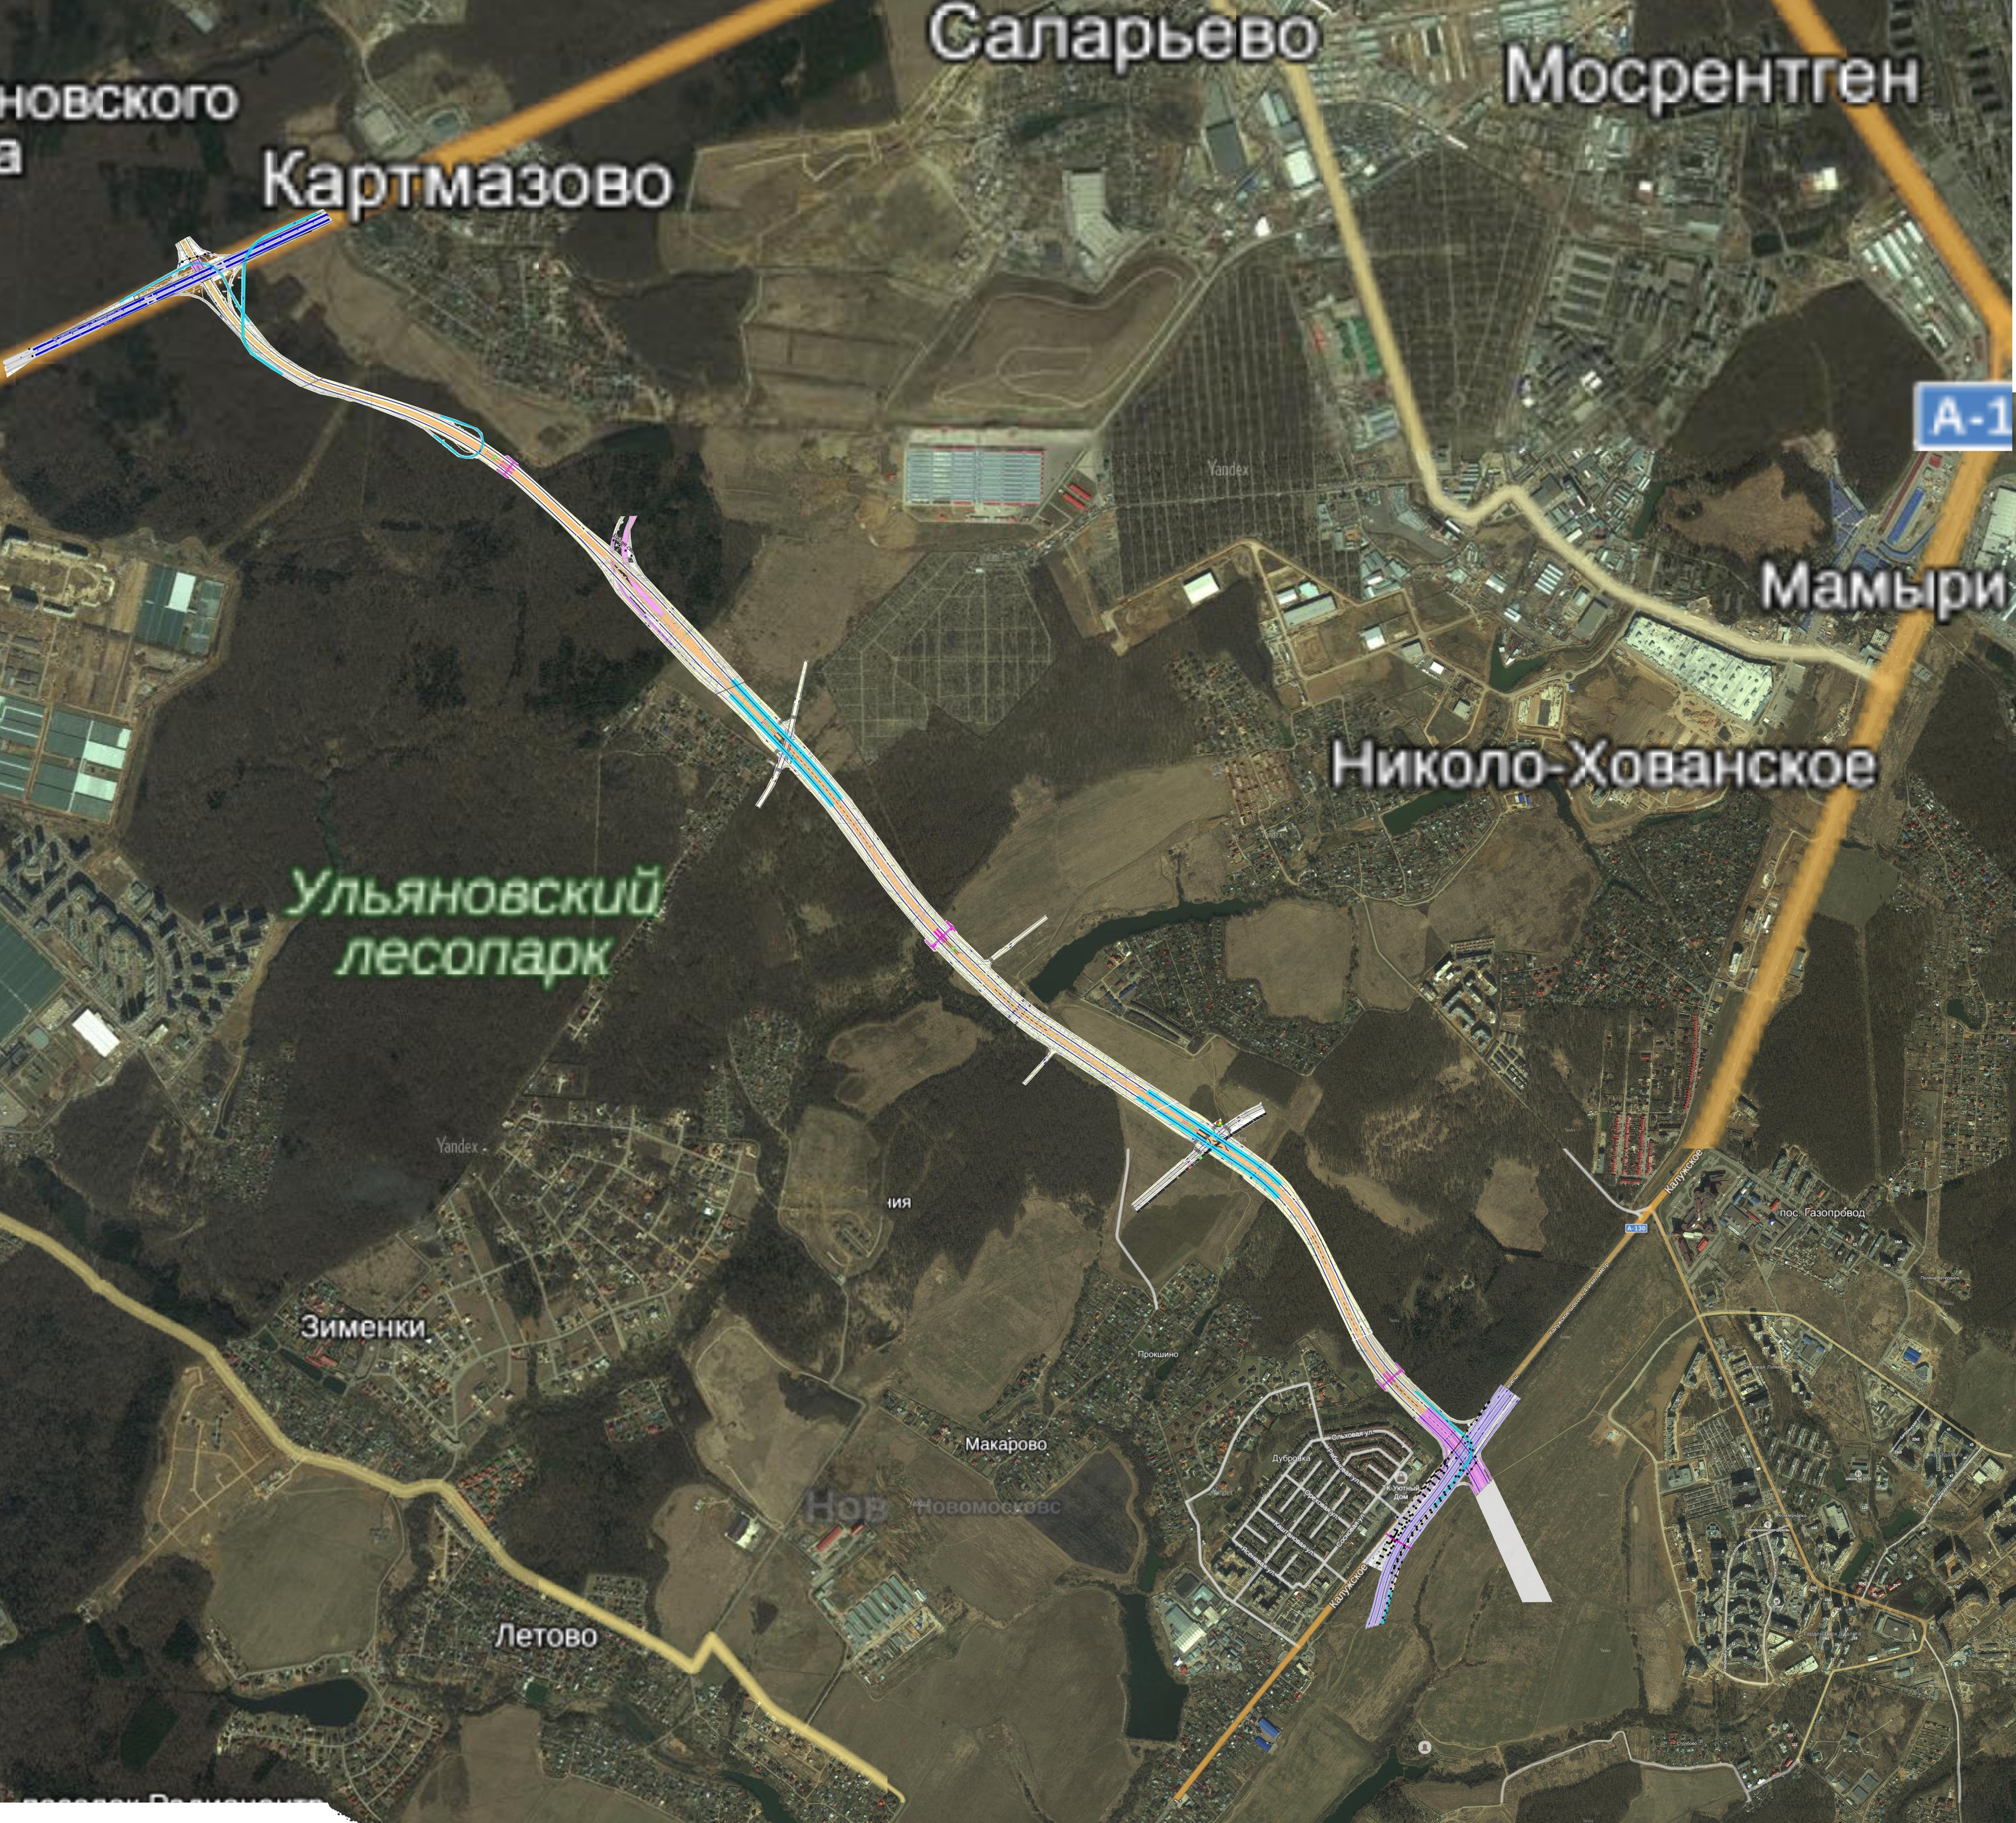 Строительство дороги солнцево бутово видное проект схема фото 296